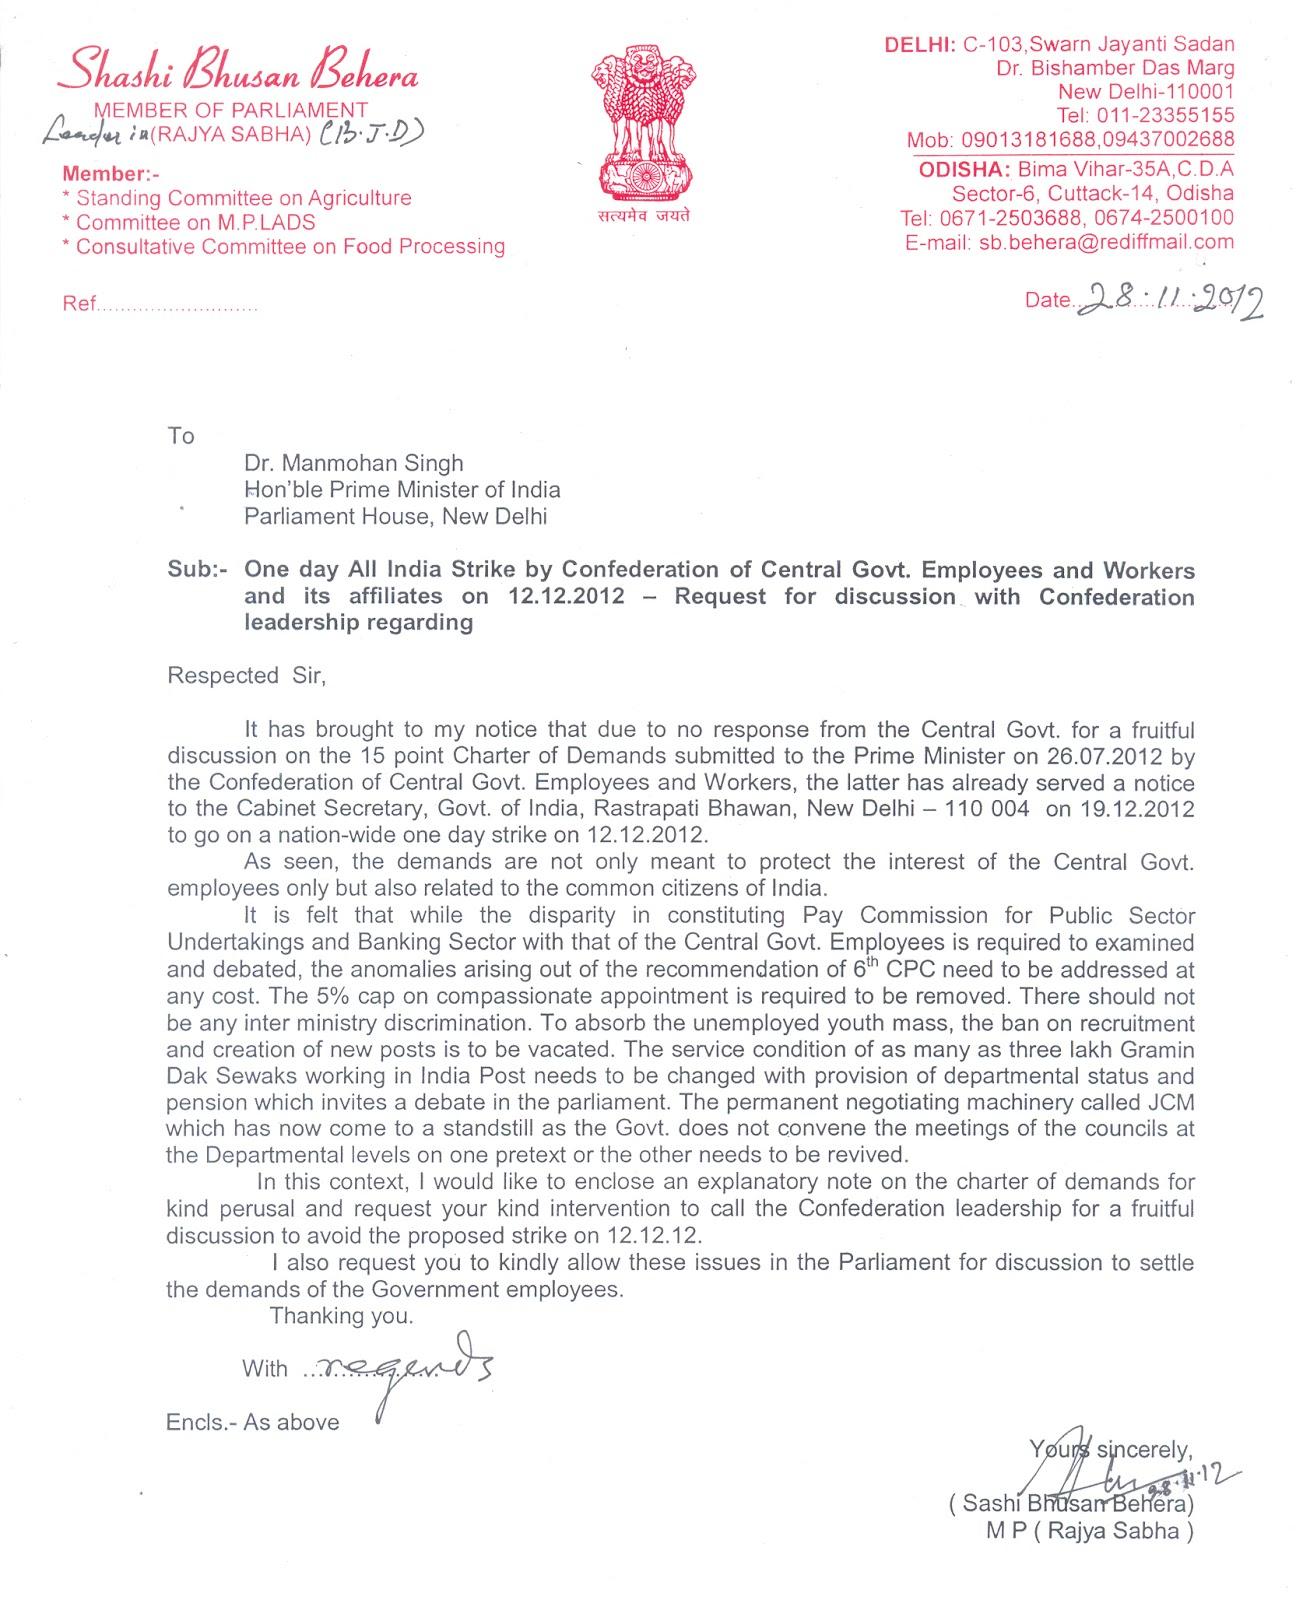 Formal letter format sample in hindi spiritdancerdesigns Image collections